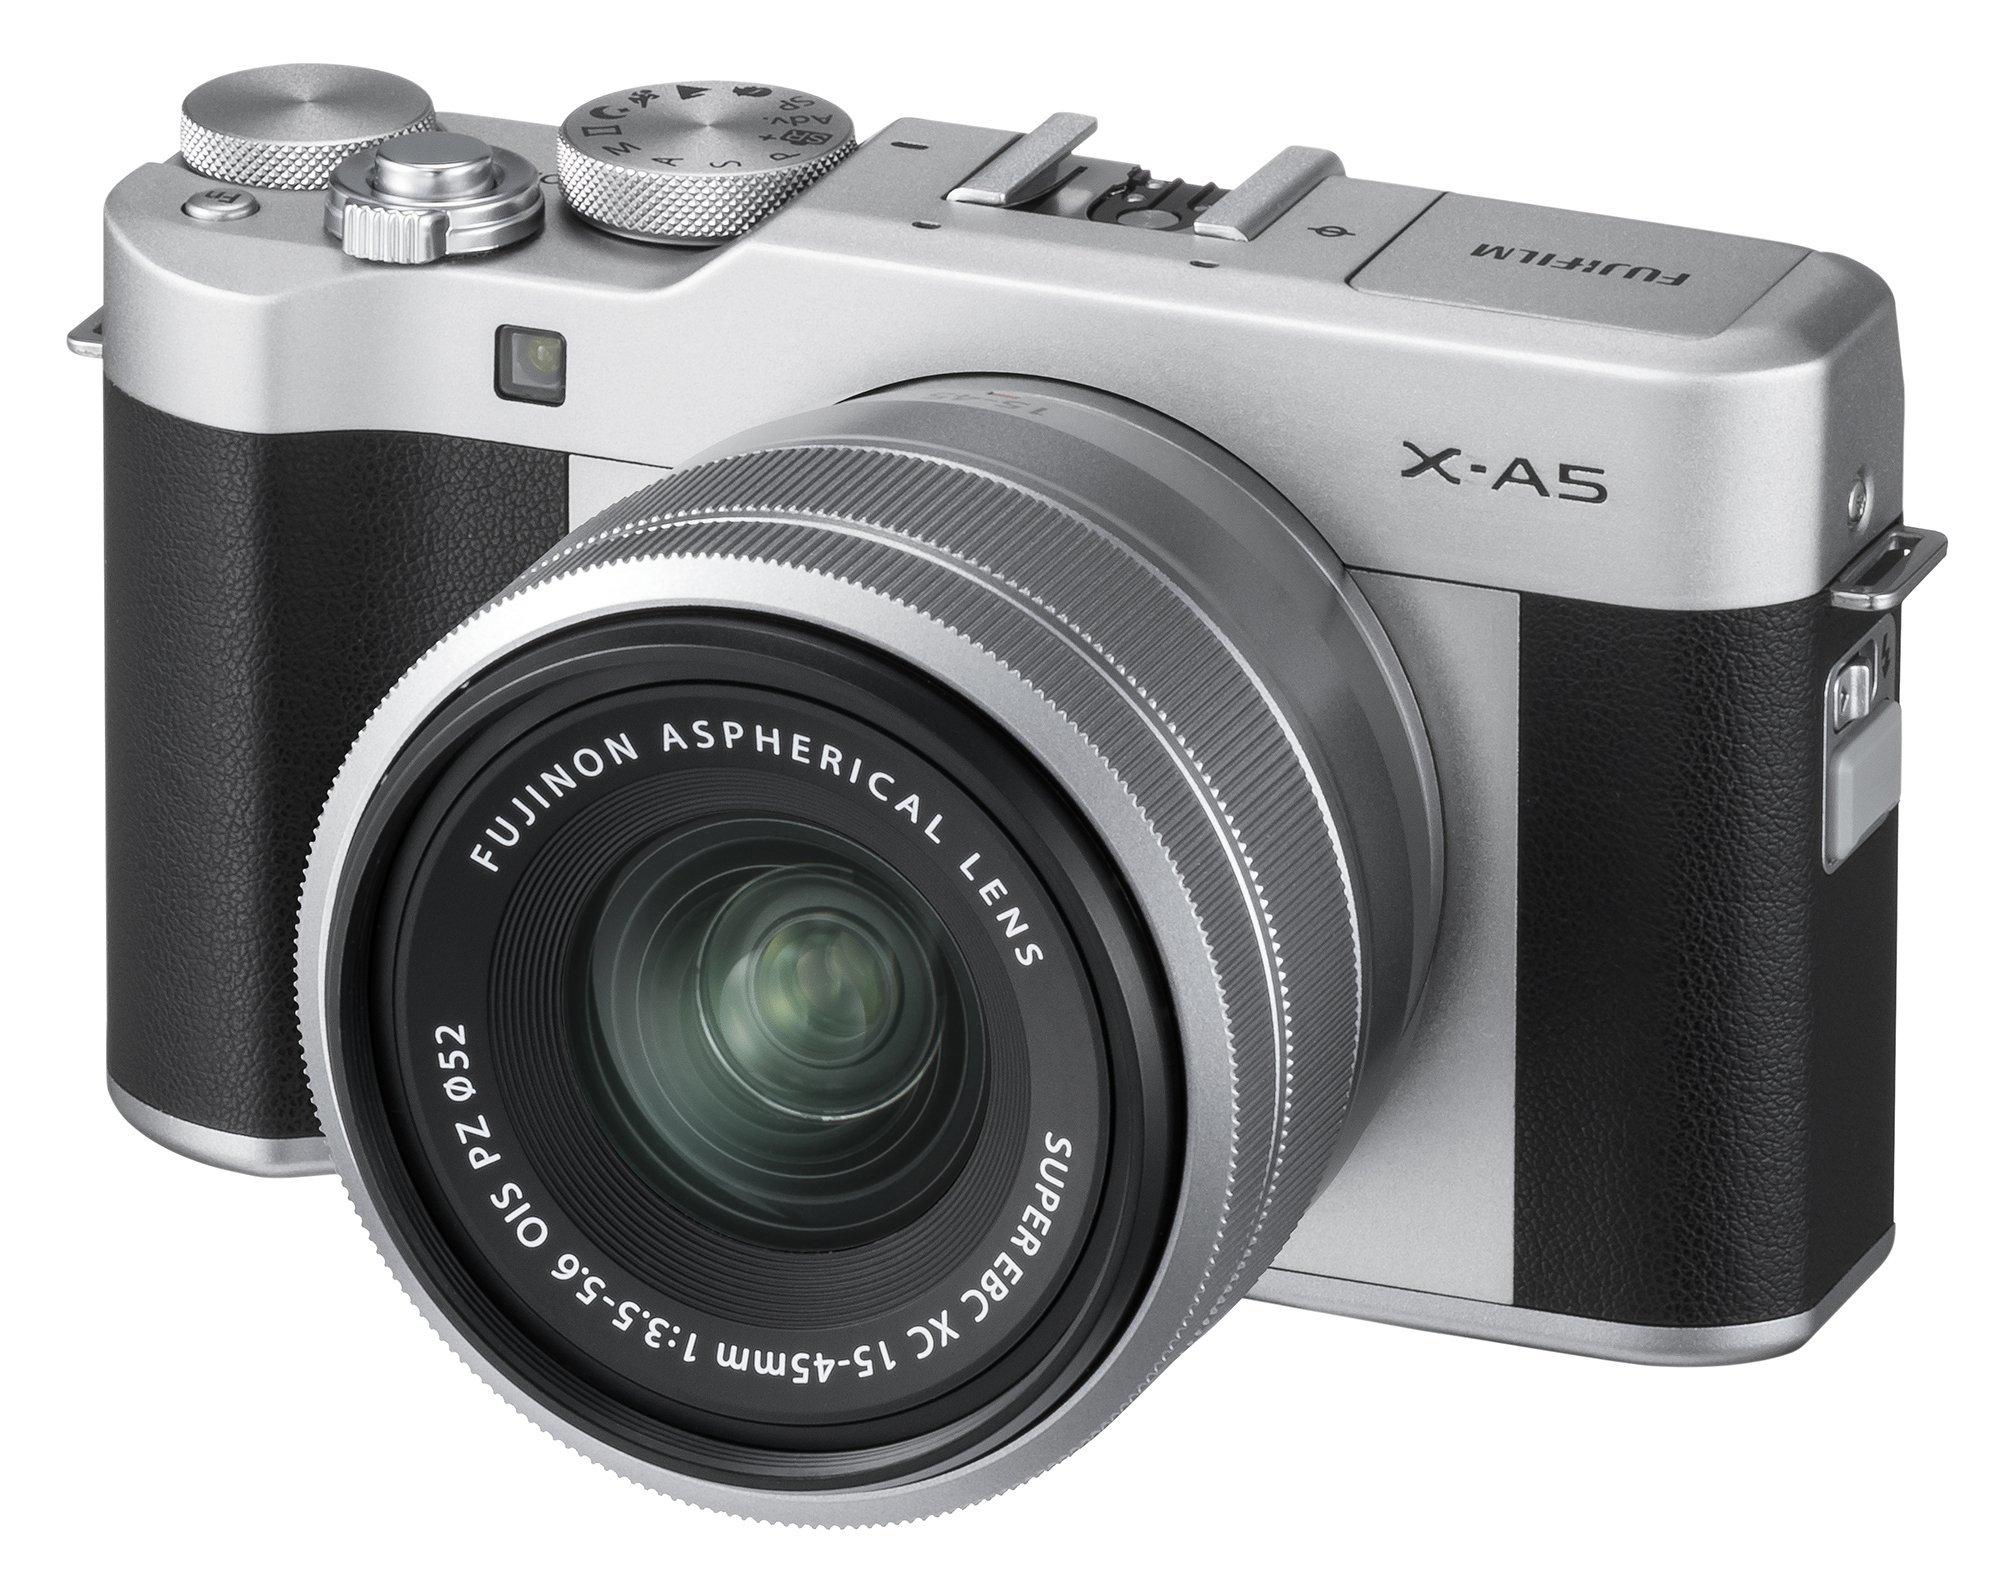 Fujifilm X-A5 Mirrorless Digital Camera w/XC15-45mmF3.5-5.6 OIS PZ Lens - Silver by Fujifilm (Image #2)